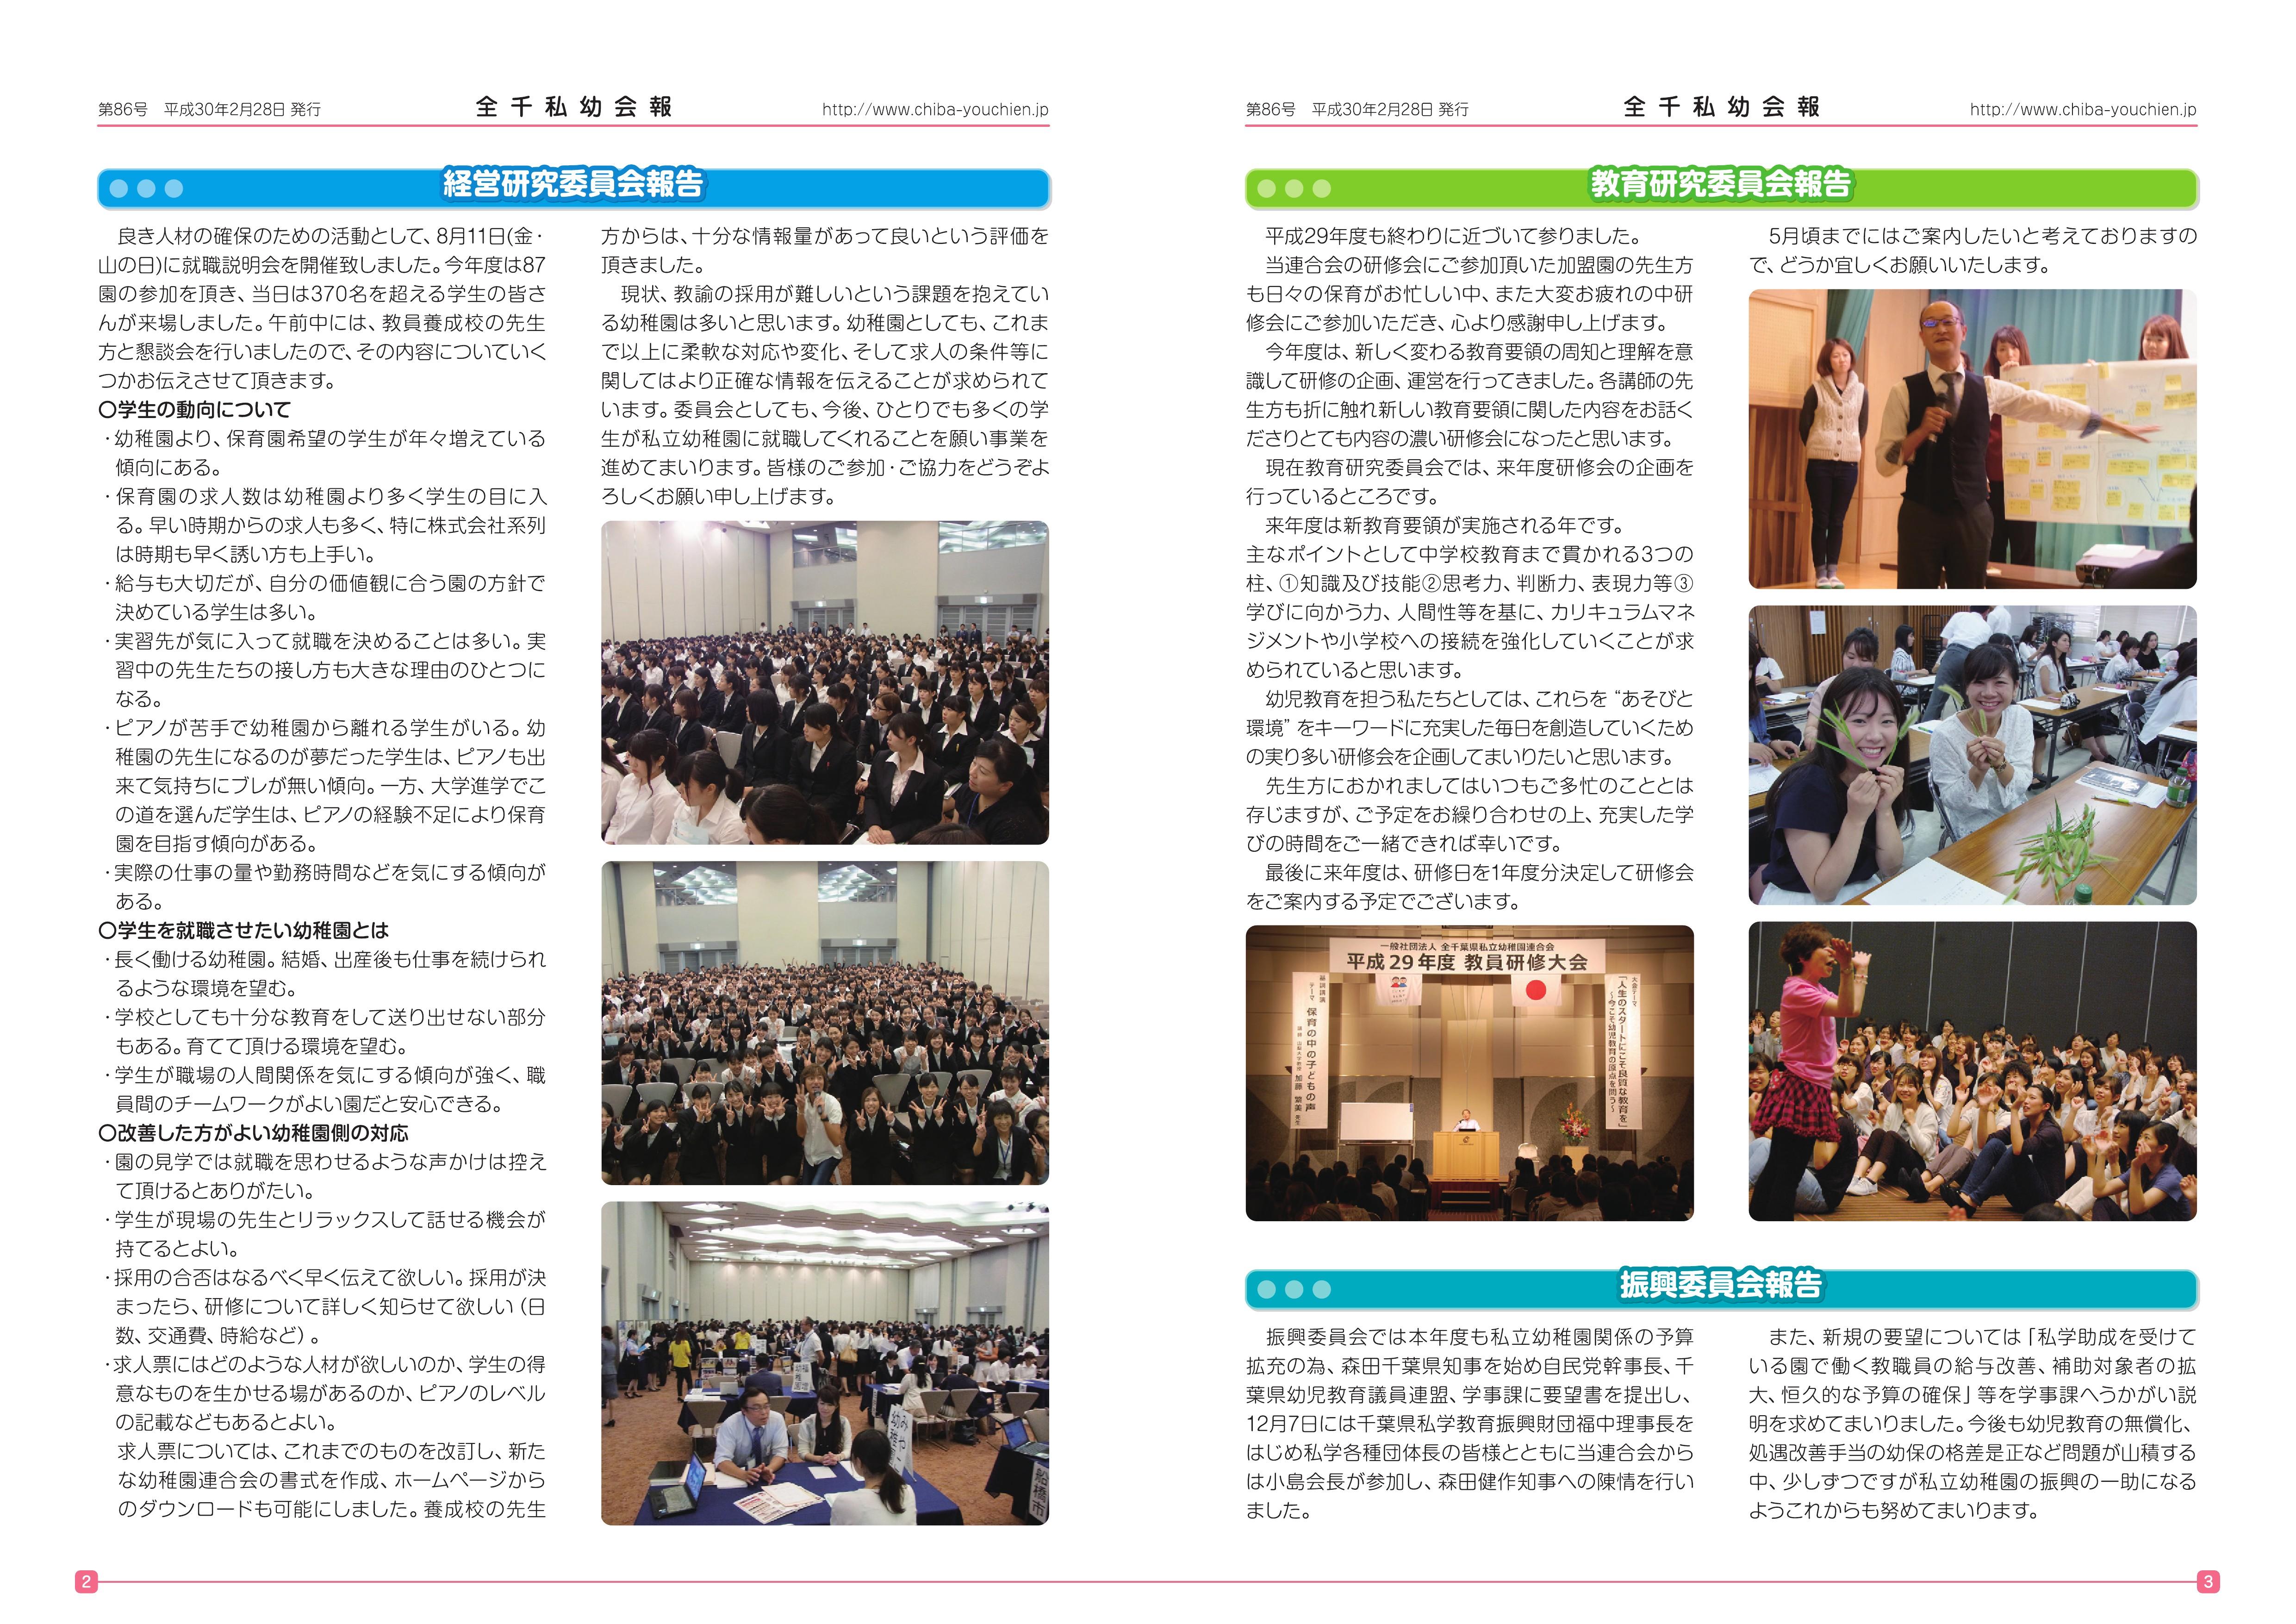 http://www.chiba-youchien.jp/news/86%E5%8F%B7P2_P3_0312.jpg